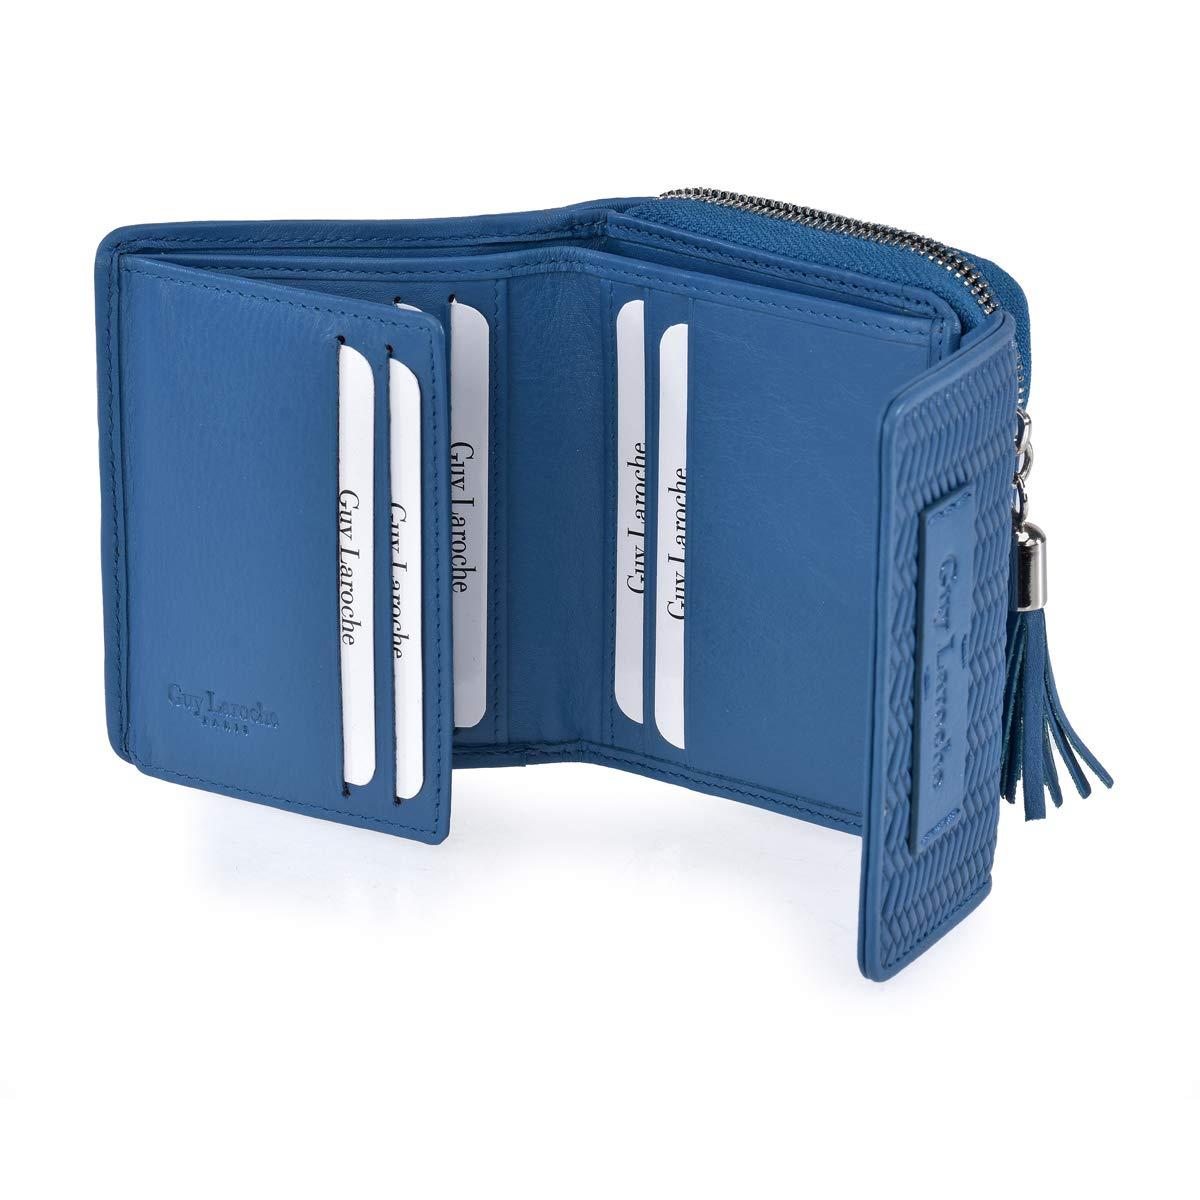 Monedero Billetero Pequeño Mujer Guy Laroche 7207 (Azul ...